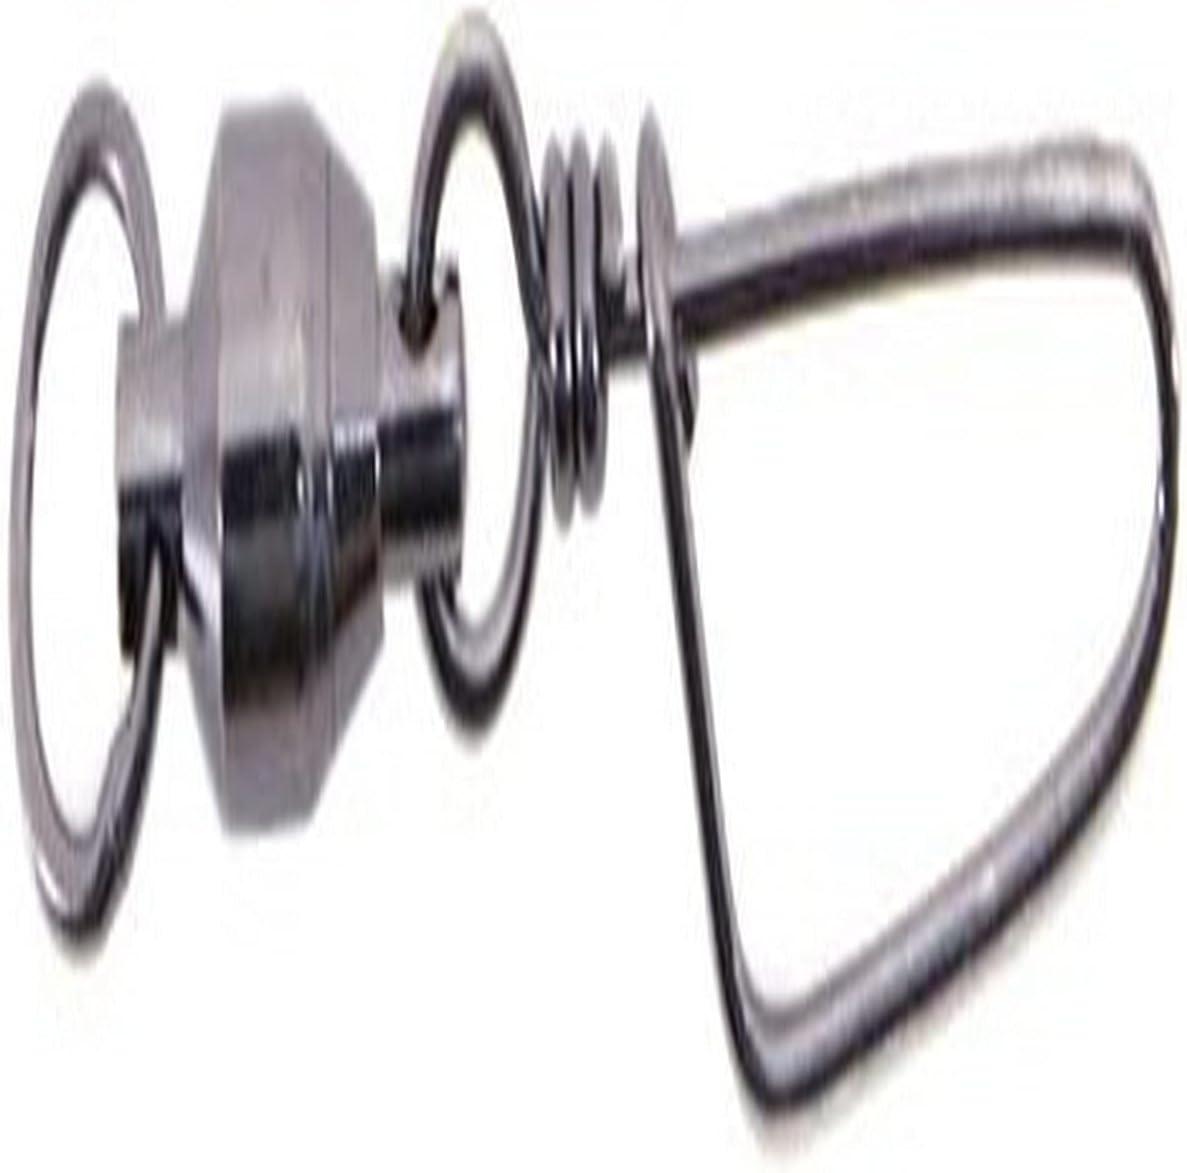 Safety-Snap #16 6 kg 3 Fois Tourbillon T 16 avec Safety Snap SPRO 3-JOINTED Swivel